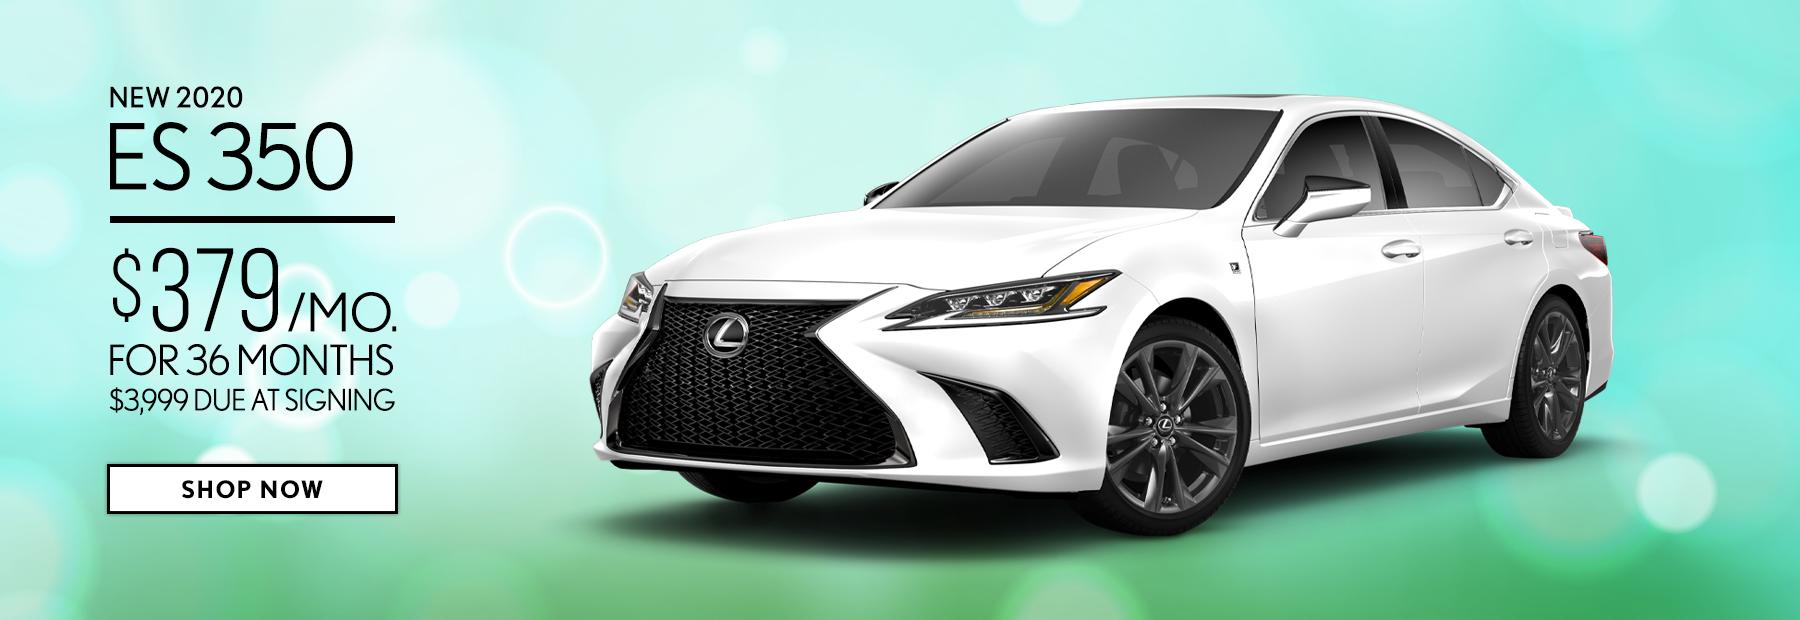 new-lease-2020-performance-lexus-es-350